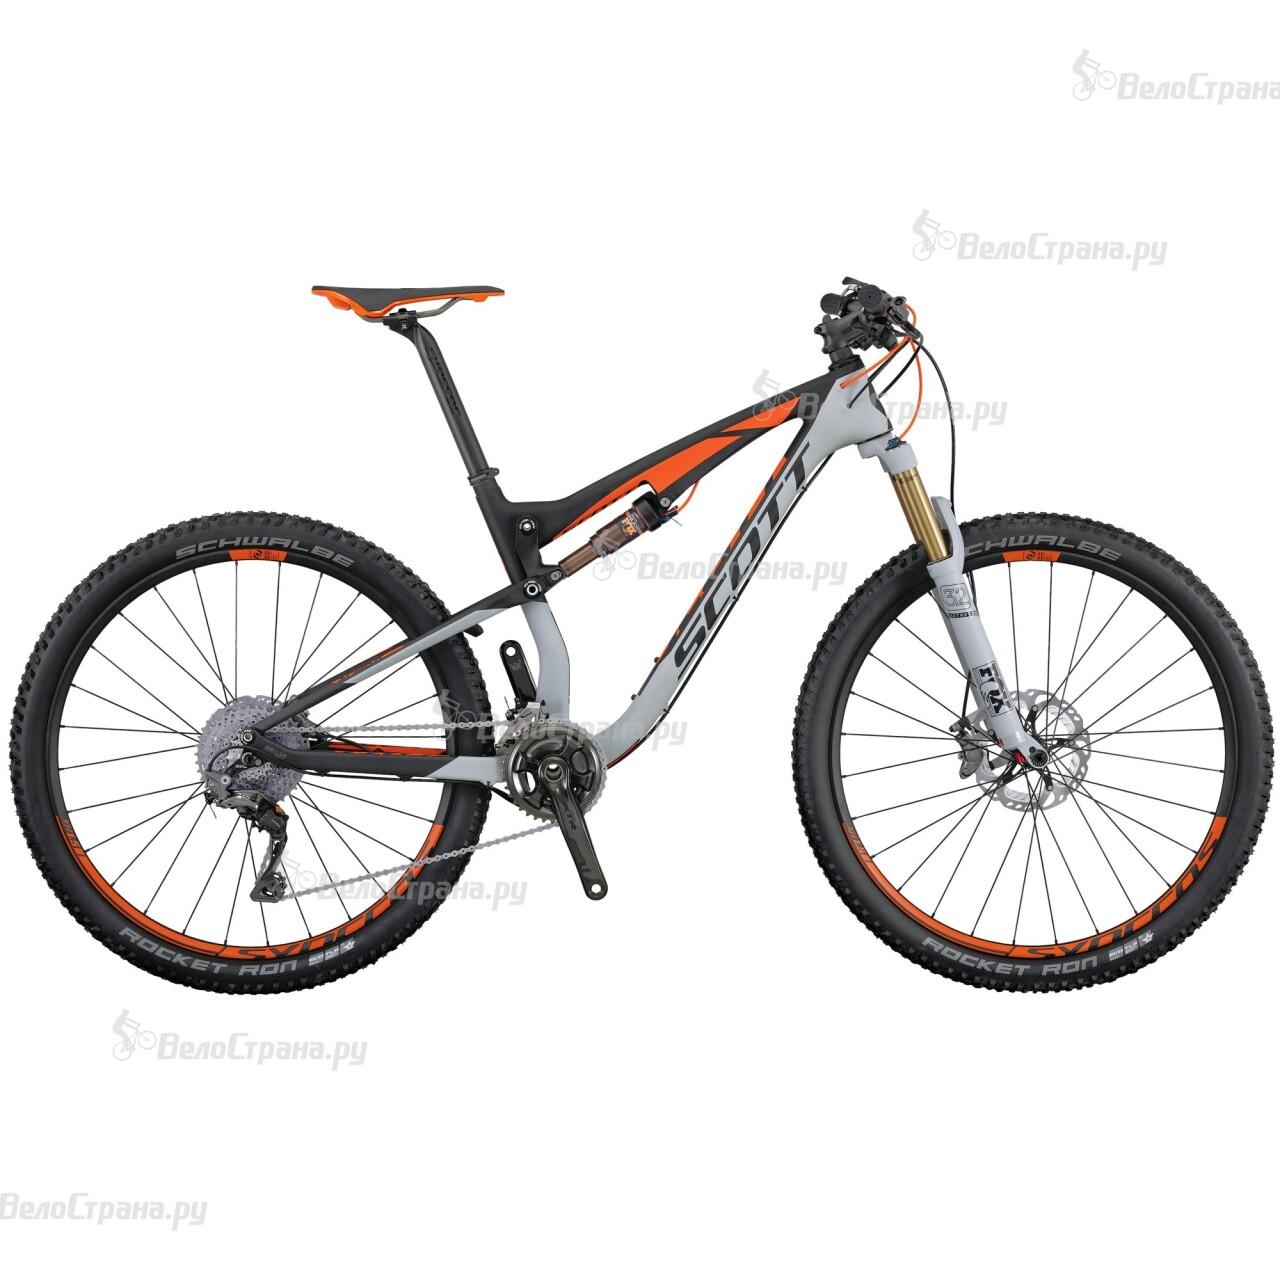 Велосипед Scott Spark 700 Premium (2016) велосипед scott spark 700 premium 2015